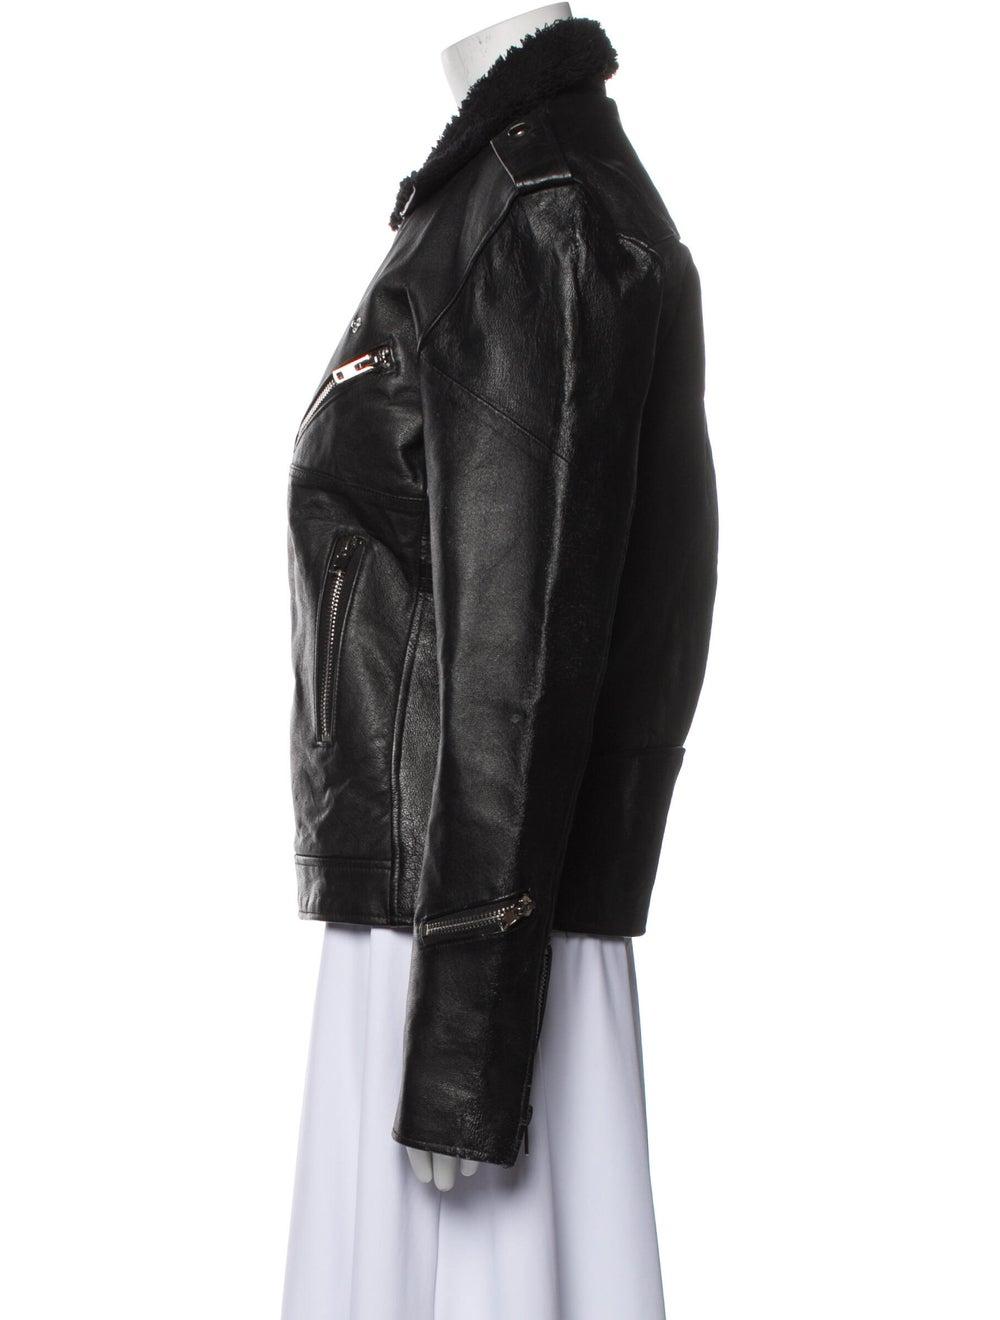 Deadwood Leather Biker Jacket Black - image 2